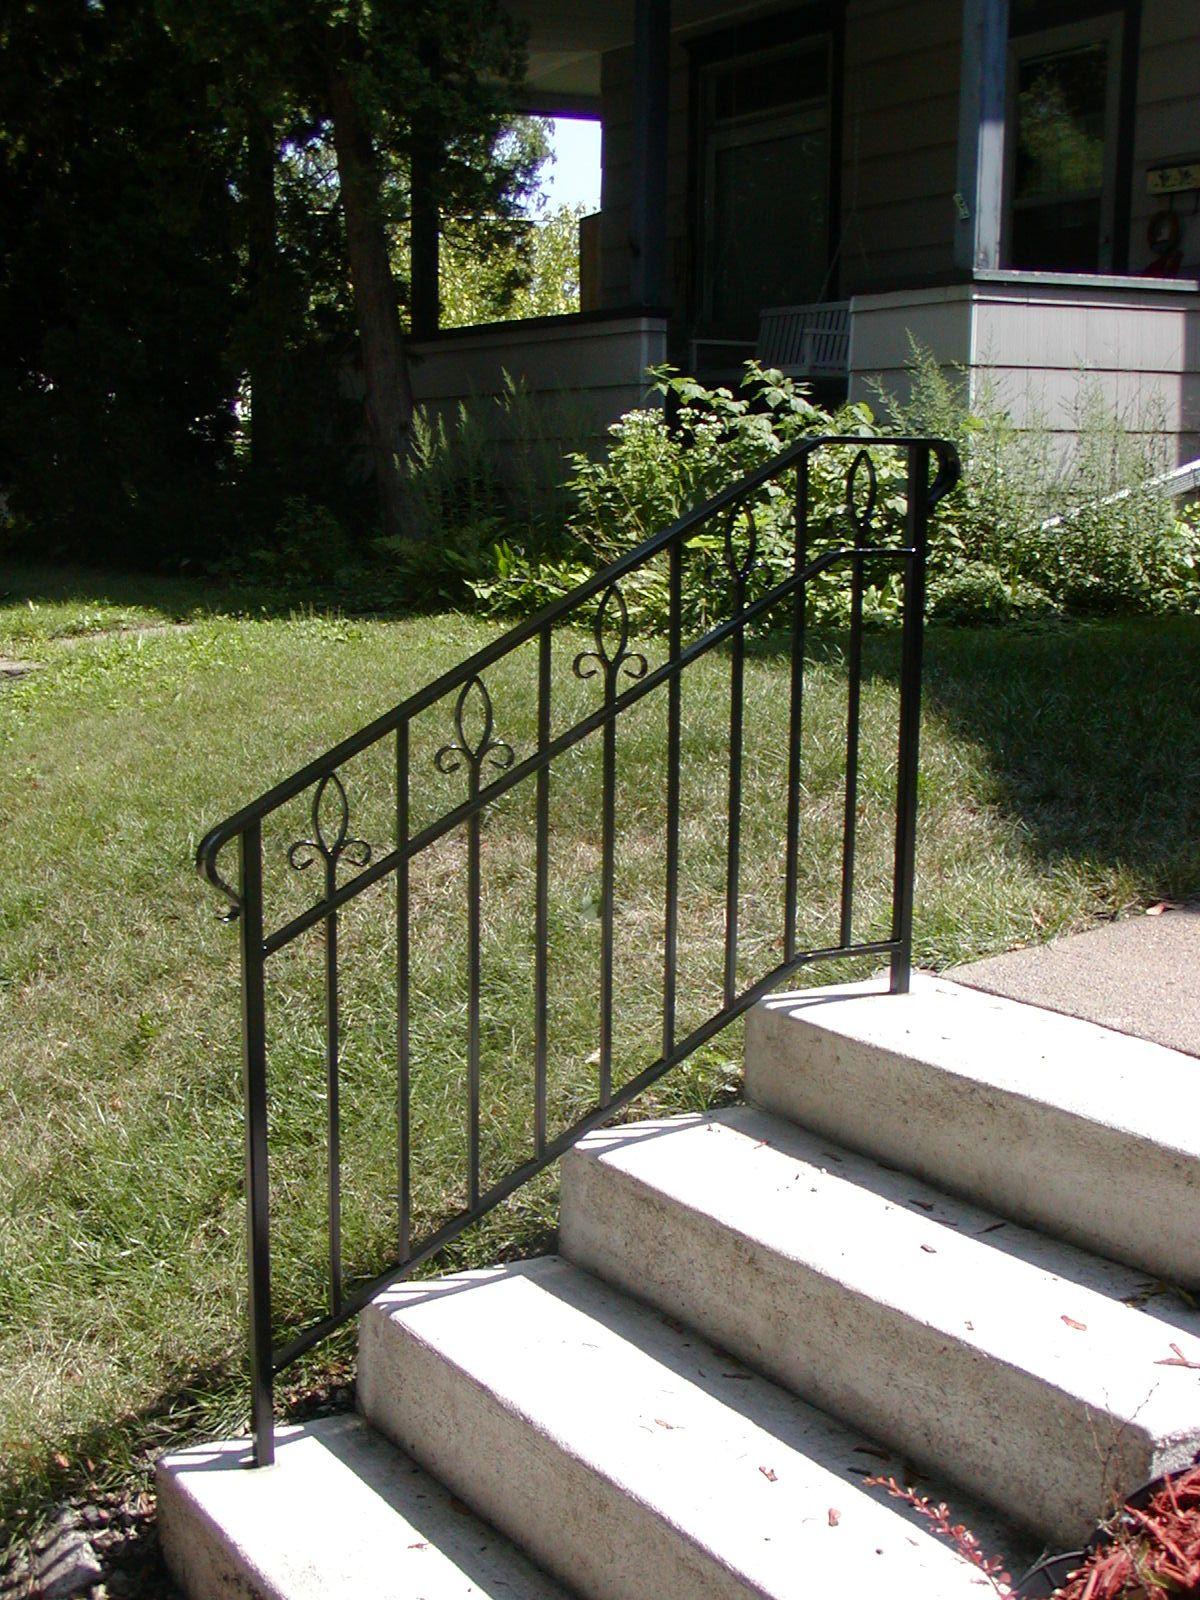 Iron Step Railing With Custom Made Fleur De Lis Designs Wrought Iron Railing Exterior Step | Wrought Iron Railings For Outside Steps